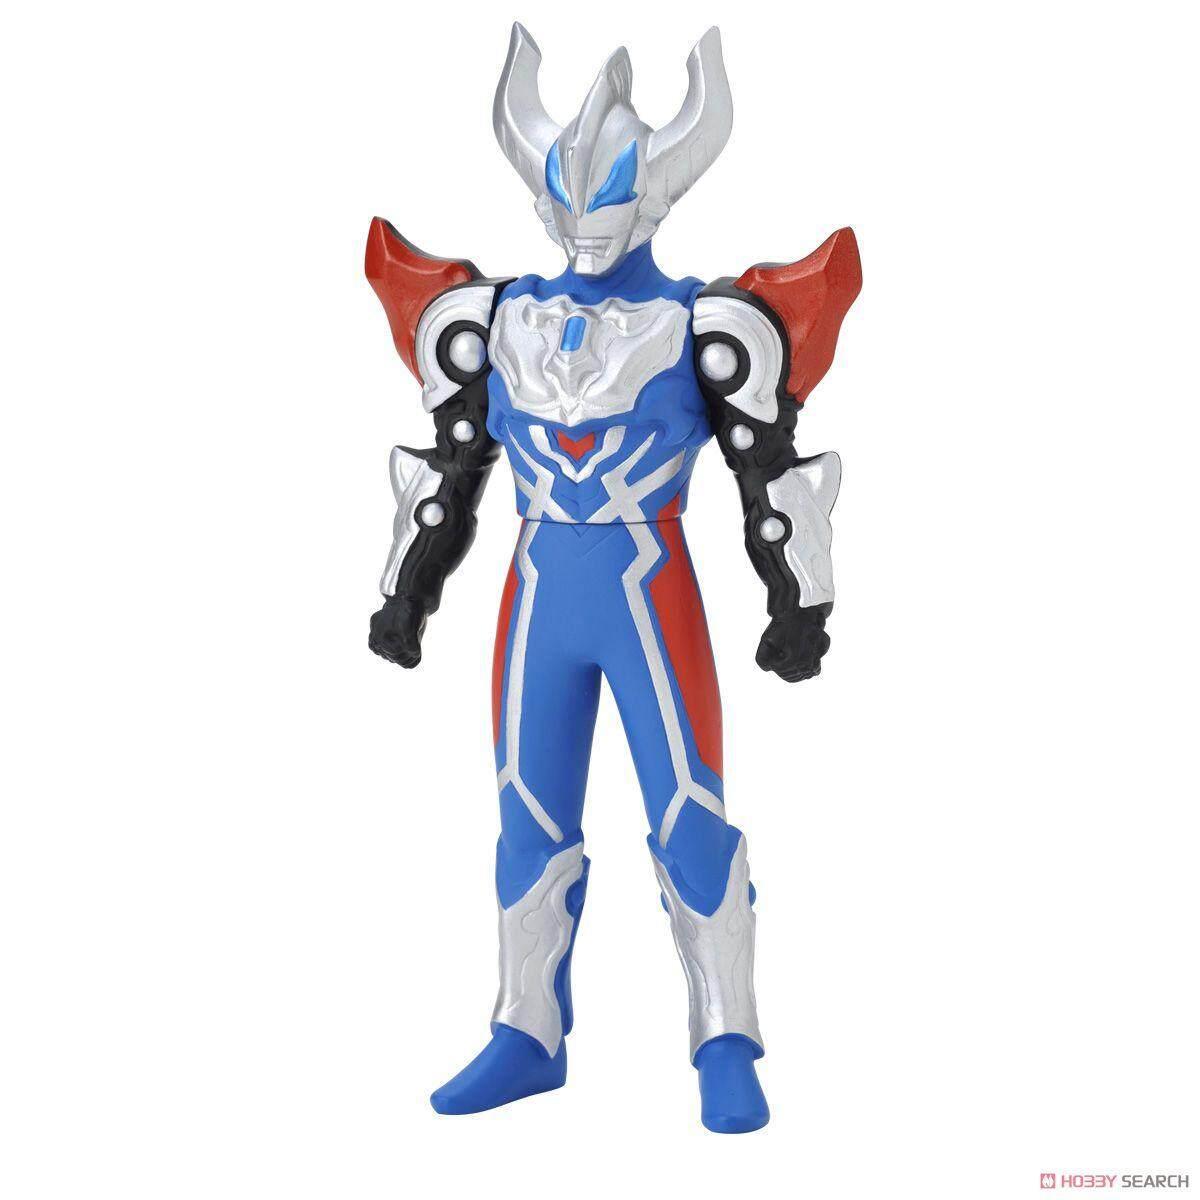 [Original Bandai] Ultra Hero 46 Ultraman Geed Magnificent (Character Toy)